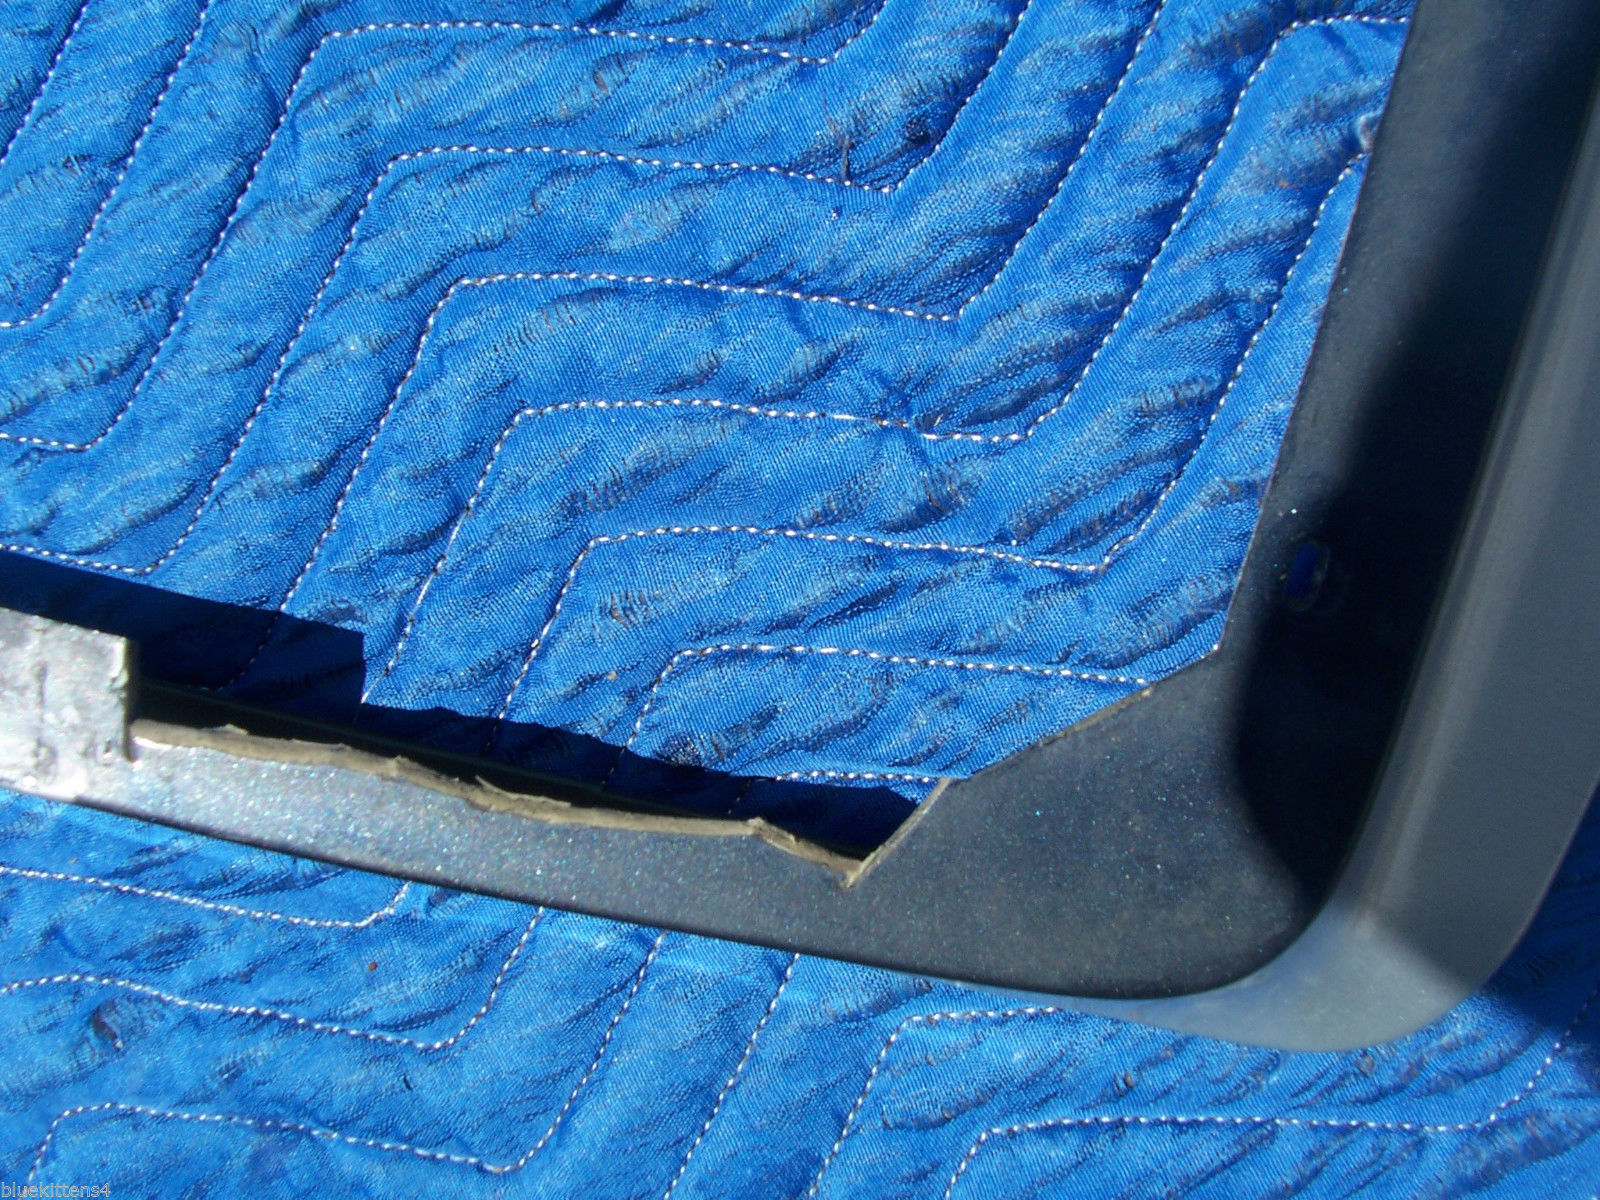 1992 BROUGHAM RIGHT BUMPER HEADER FILLER PANEL GRAY OEM USED ORIG CADILLAC 1991 image 3